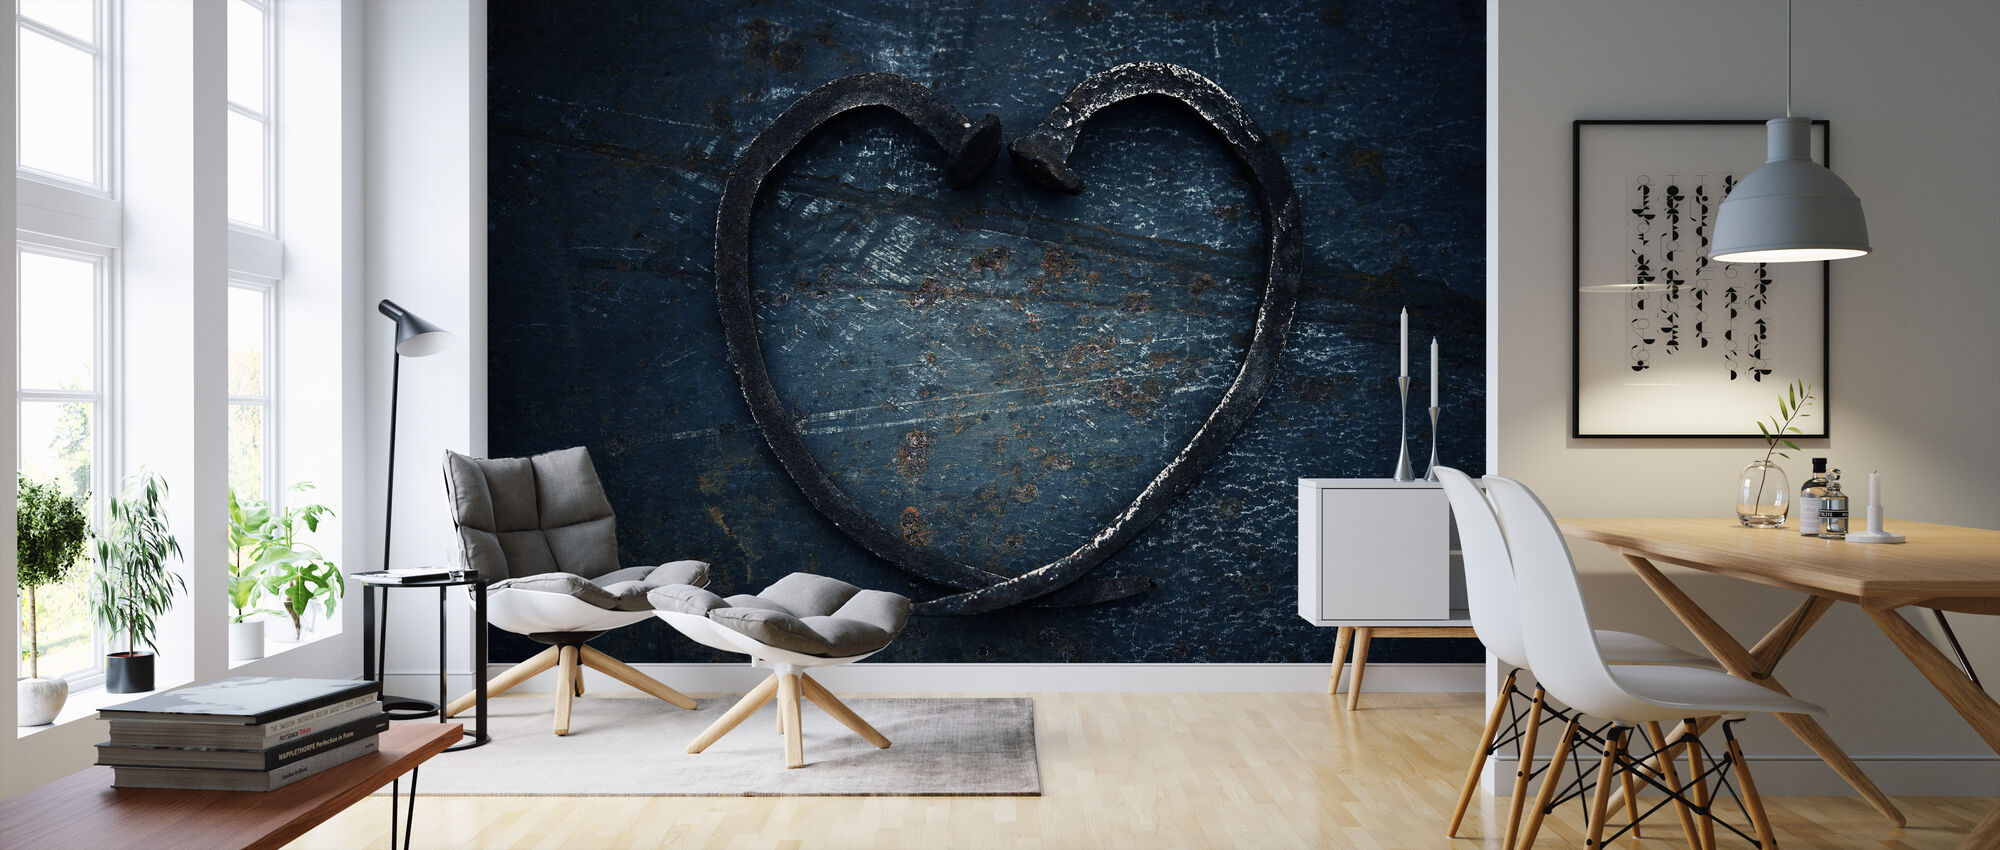 Heart of Nails - Wallpaper - Living Room